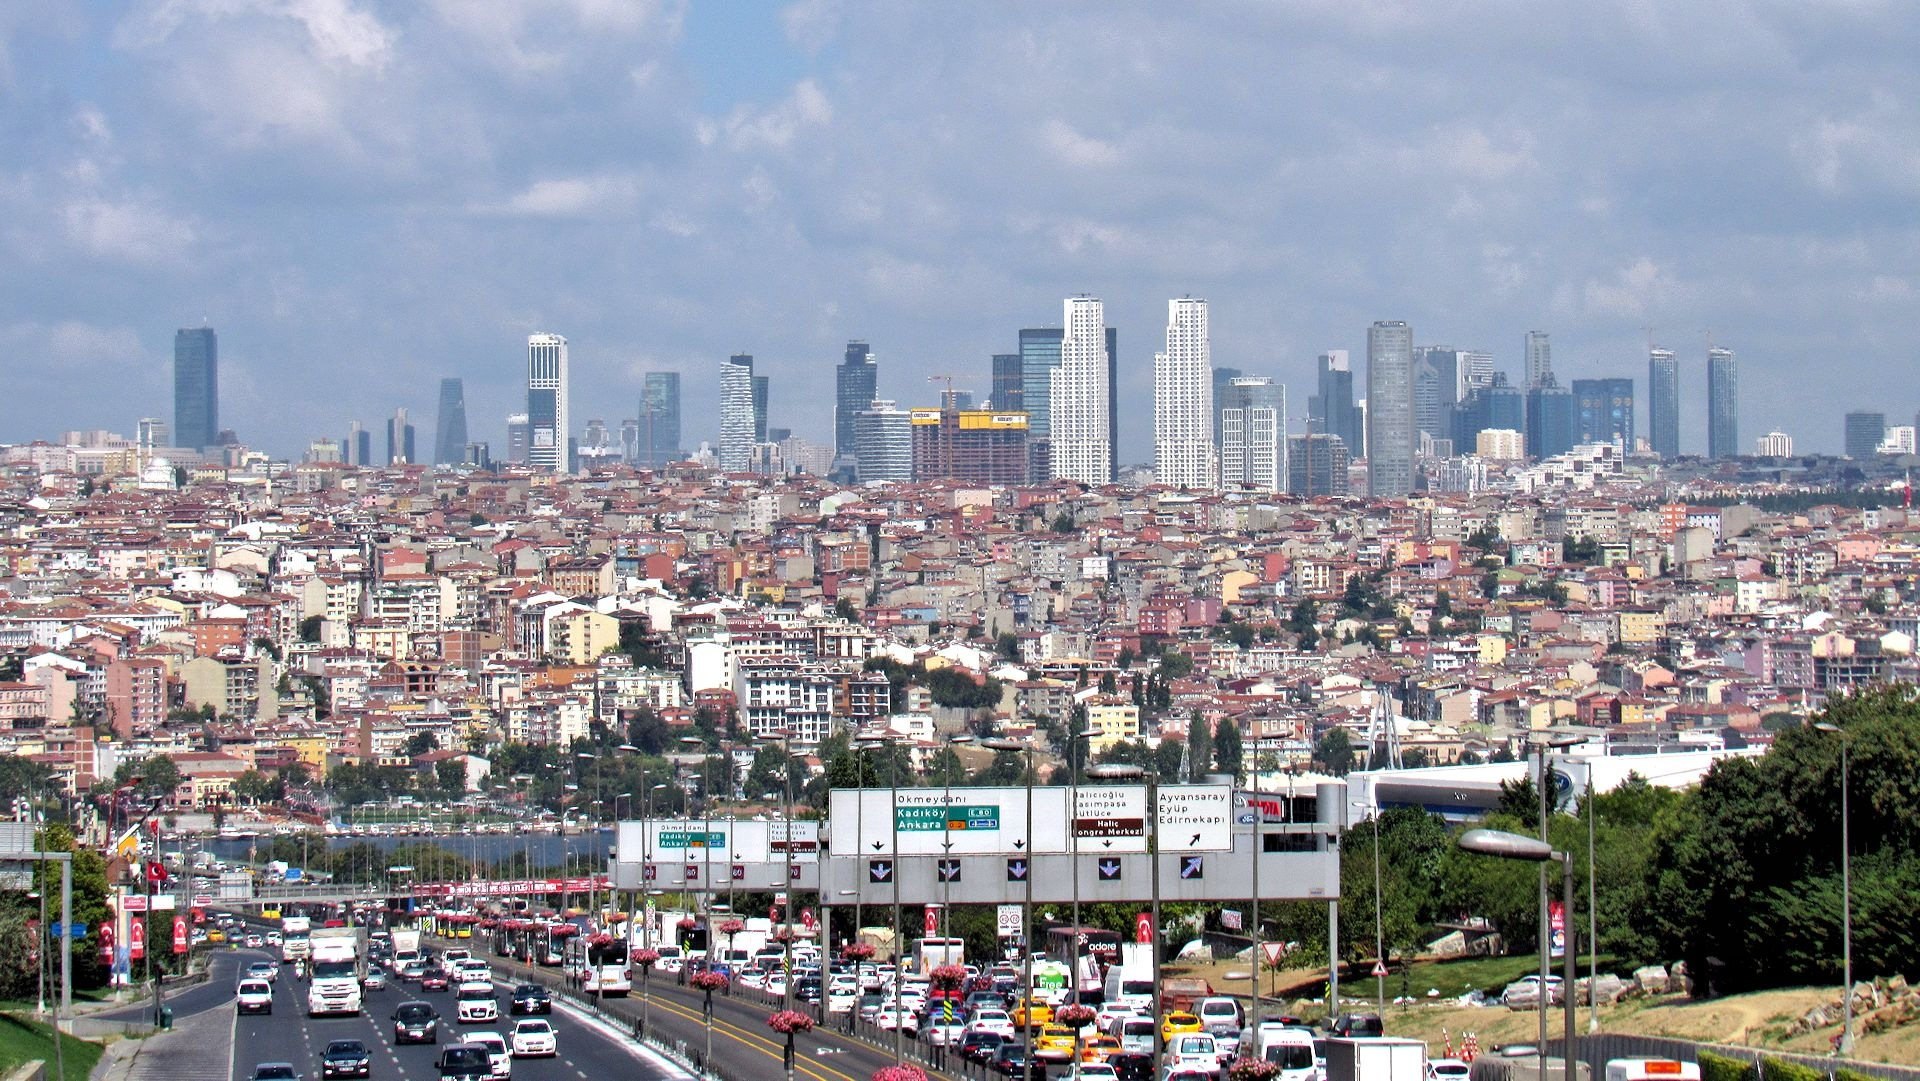 Istanbul Skyscrapers by Faruk Koçak